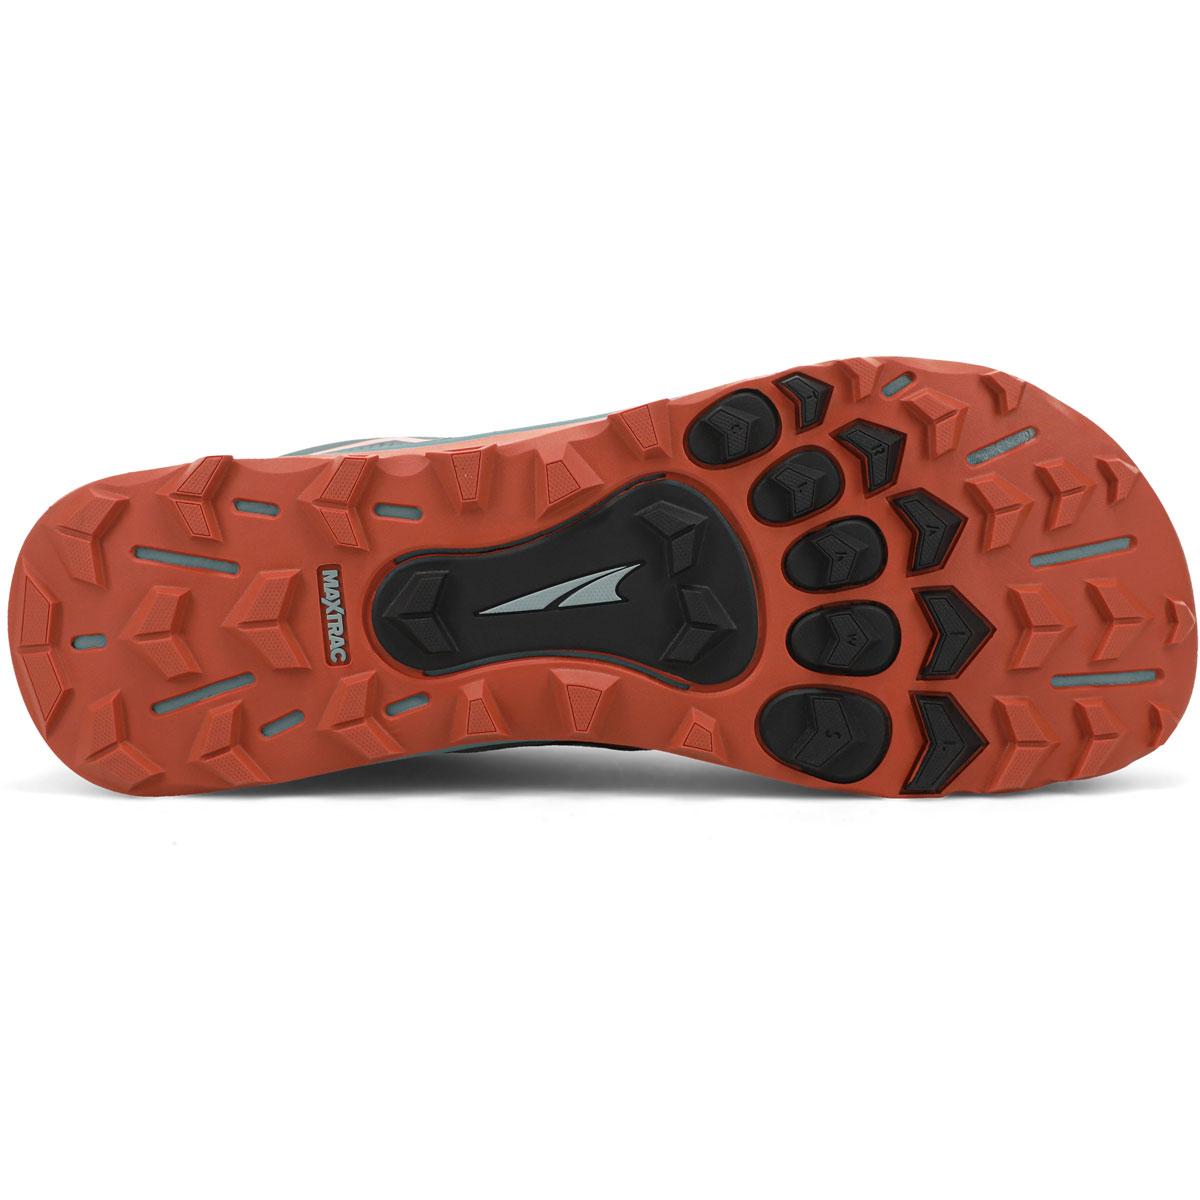 Men's Altra Lone Peak 5 Trail Running Shoe - Color: Gray/Orange - Size: 7 - Width: Regular, Gray/Orange, large, image 3